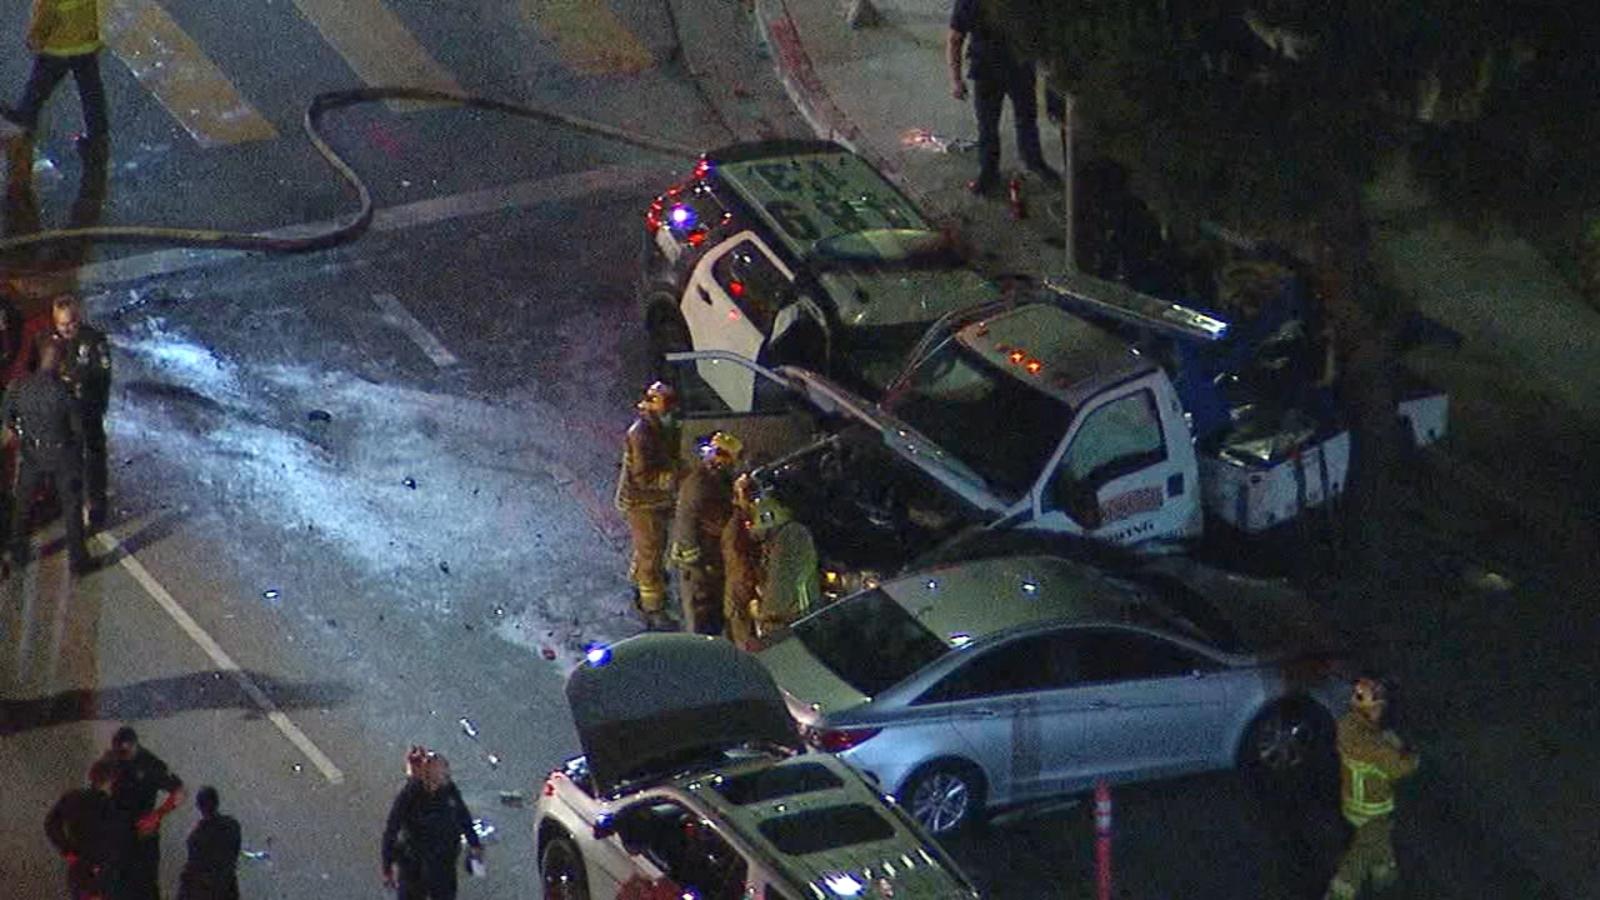 South LA crash: At least 8 injured after multi-vehicle crash involving LAPD vehicle